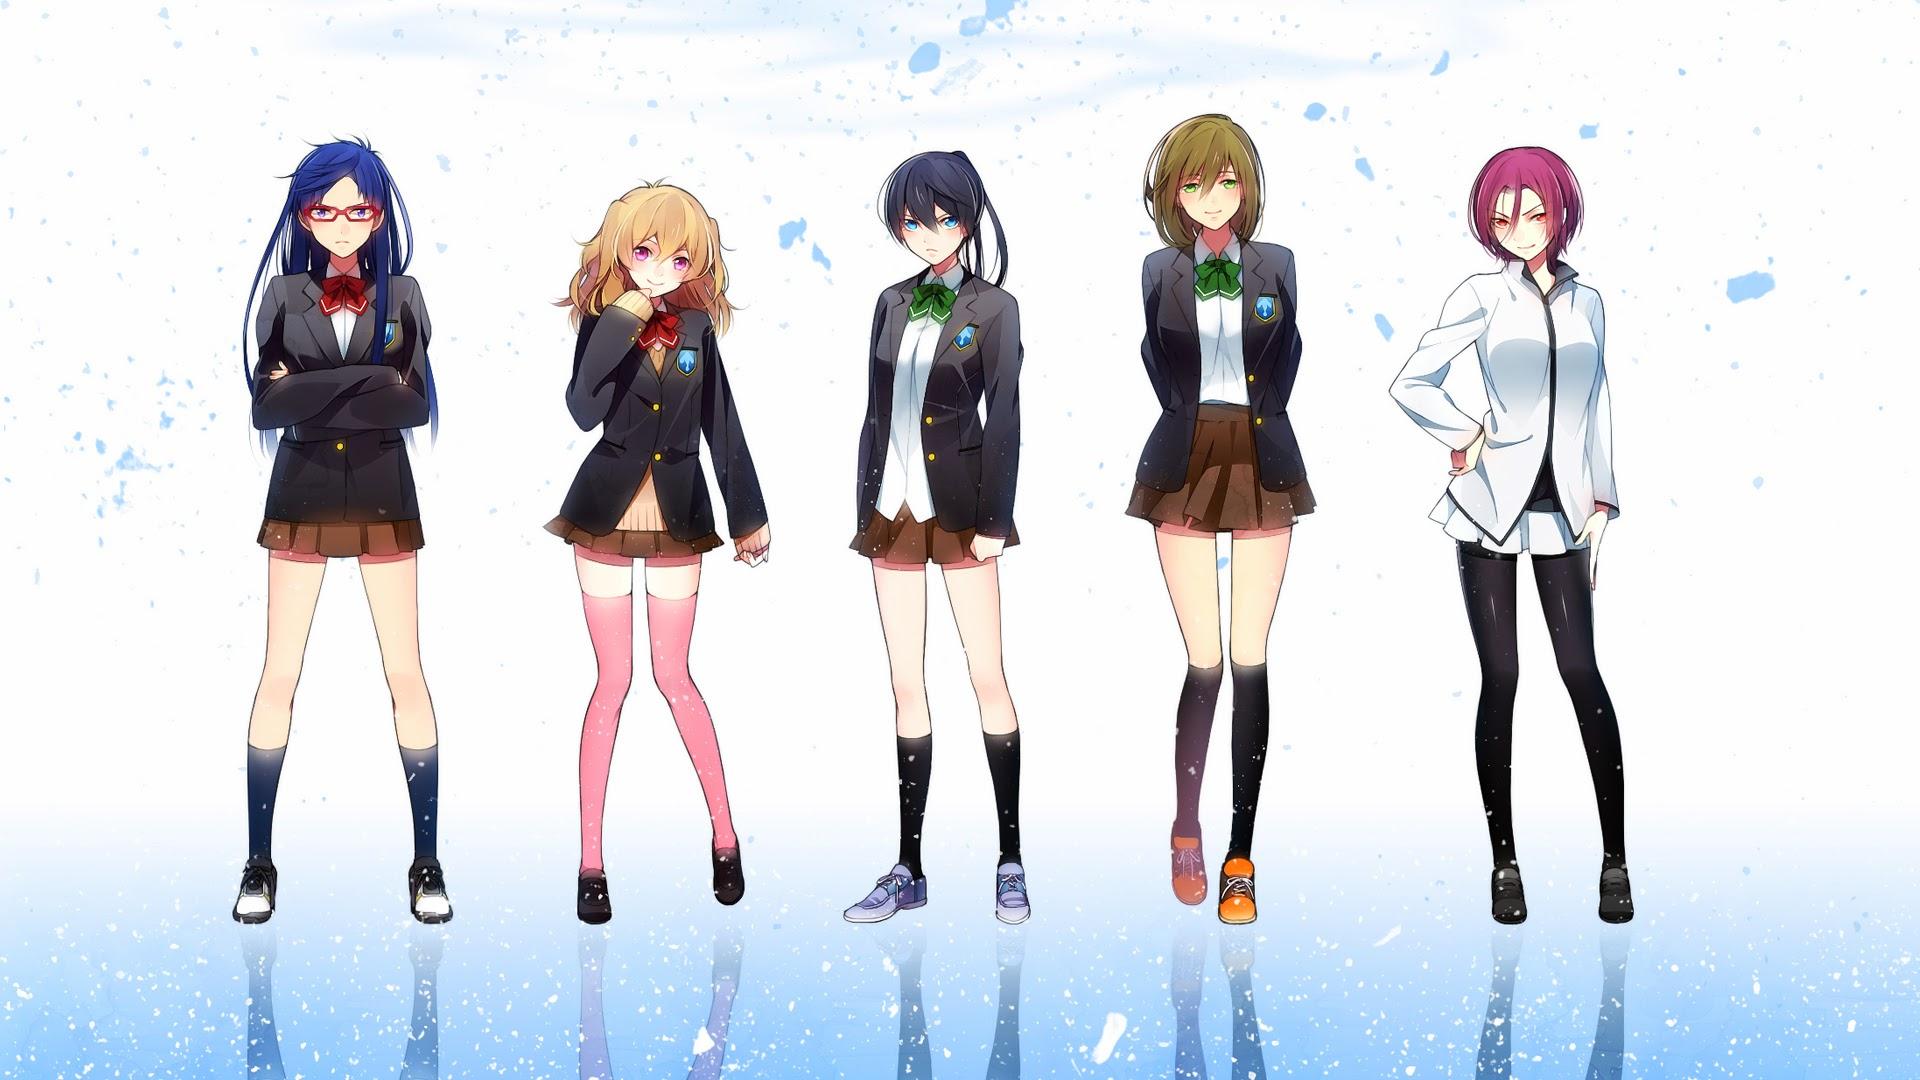 Iwatobi Swim Club Anime Boys characters Nagisa Hazuki Rin 1920x1080